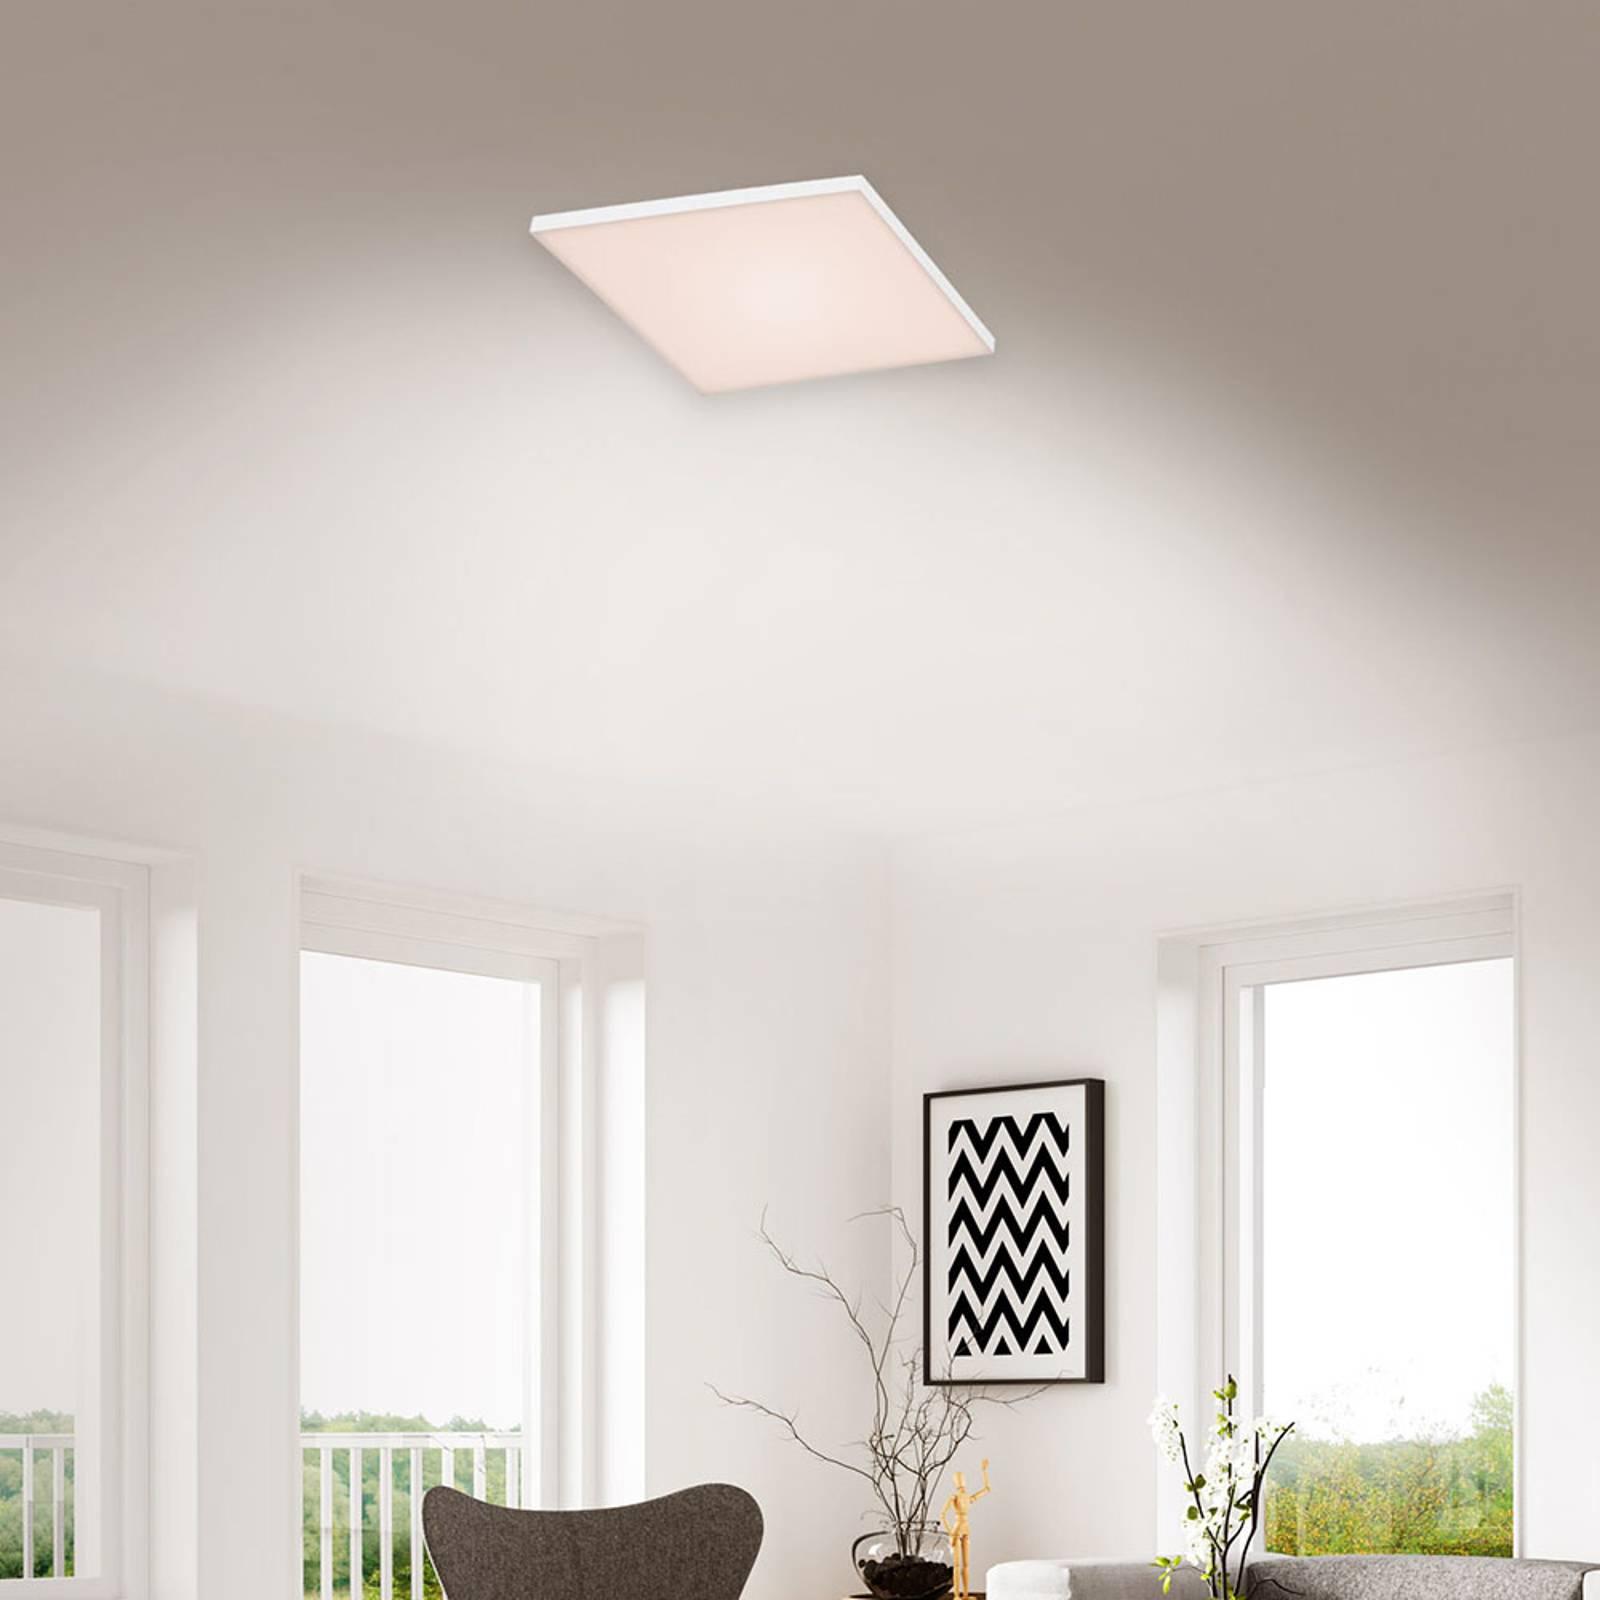 Lampa sufitowa LED Frameless RGBW, 30x30cm